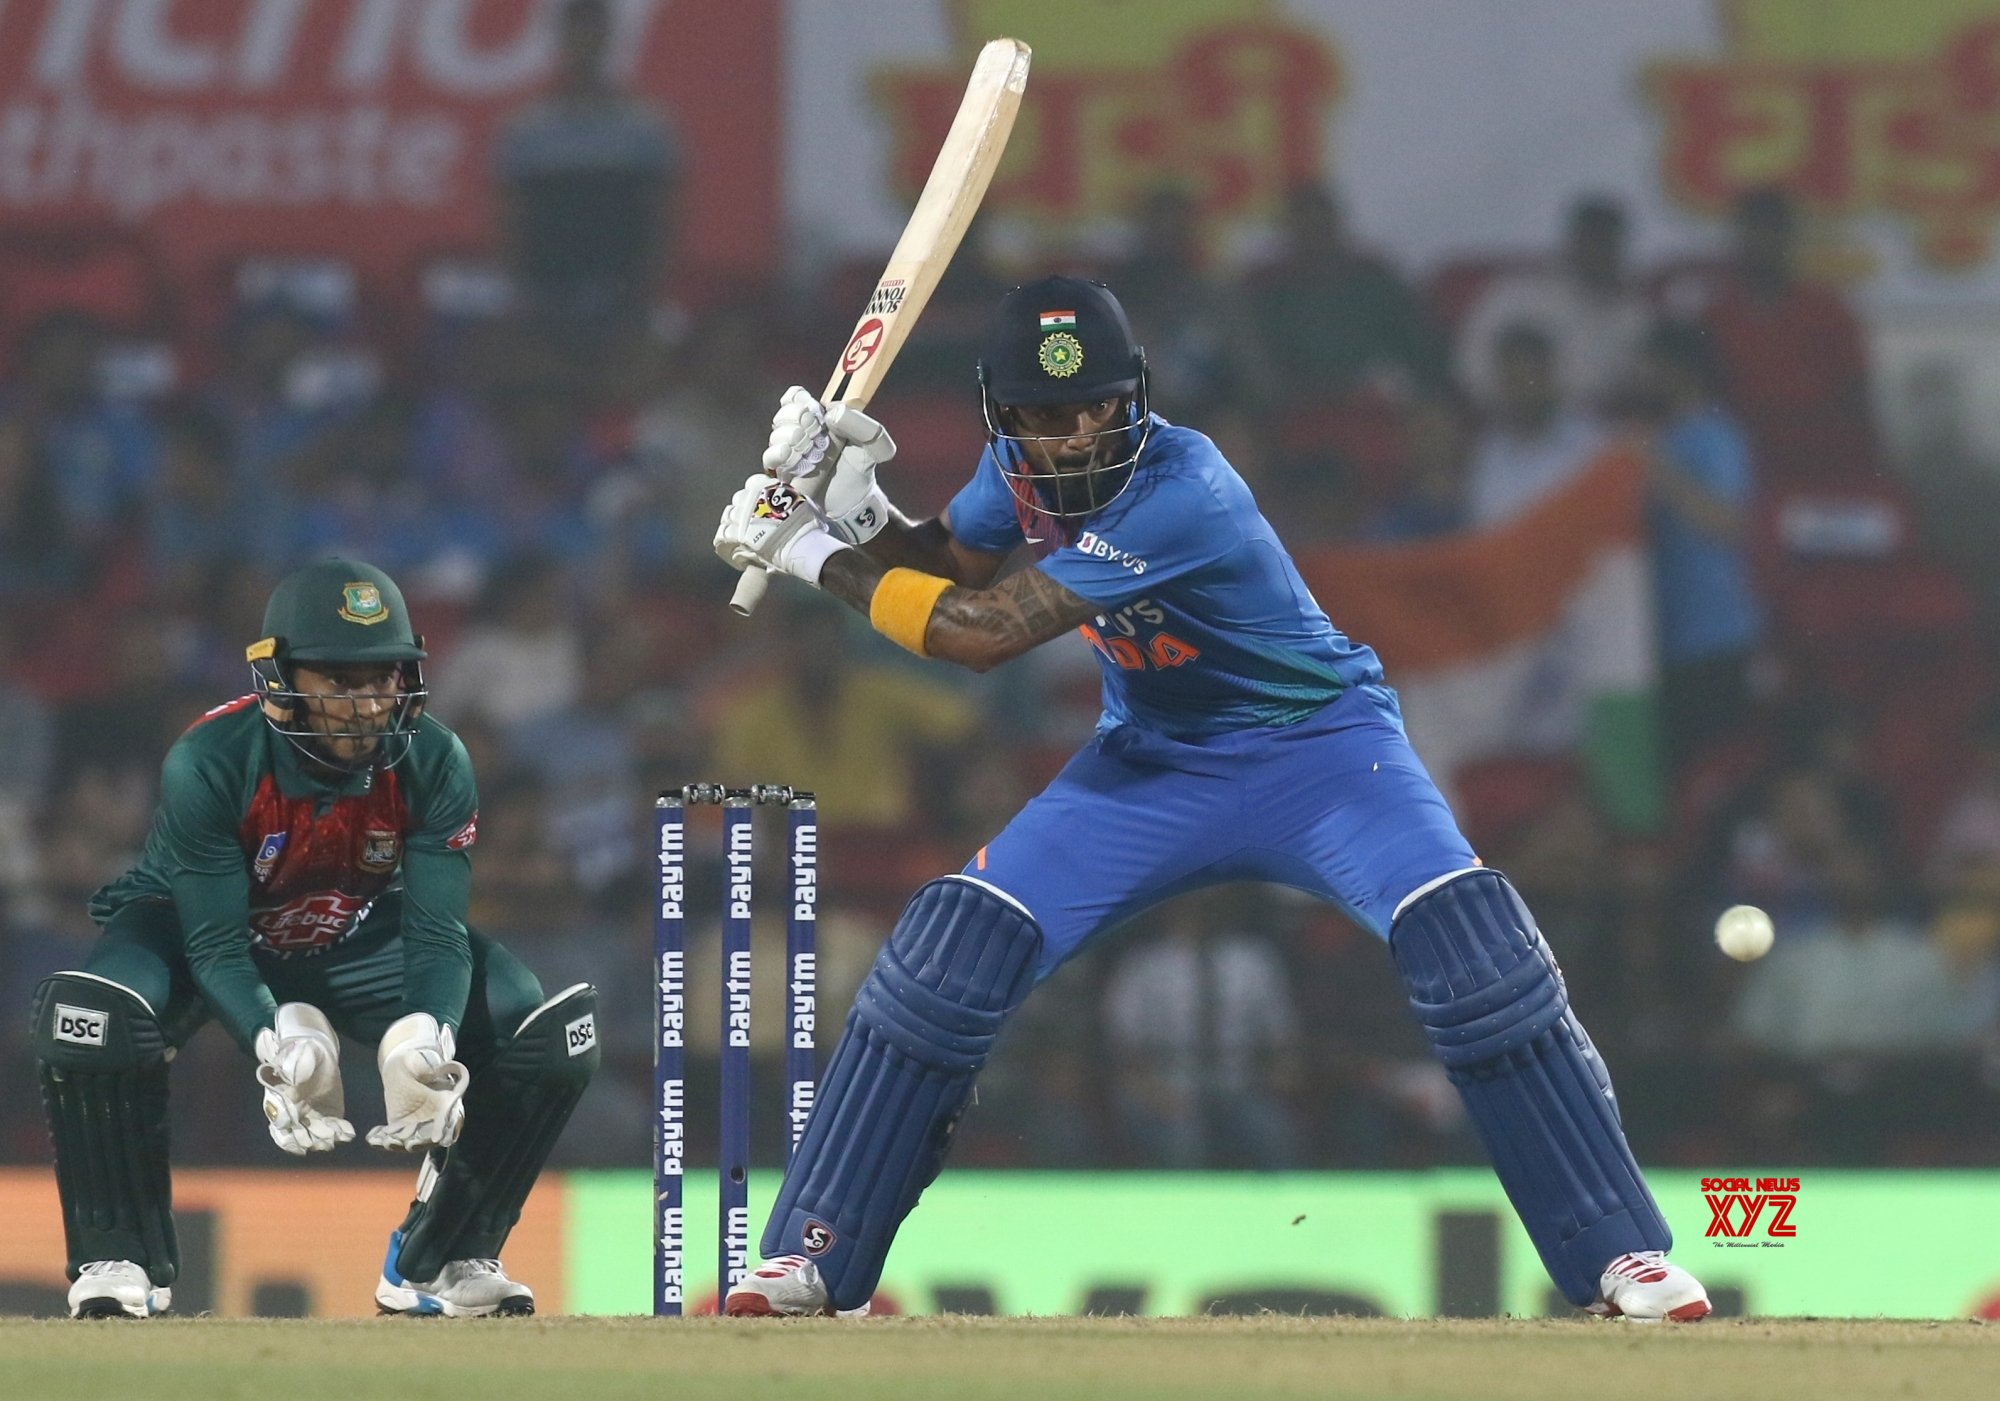 Nagpur: 3rd T20I - India Vs Bangladesh (Batch - 8) #Gallery